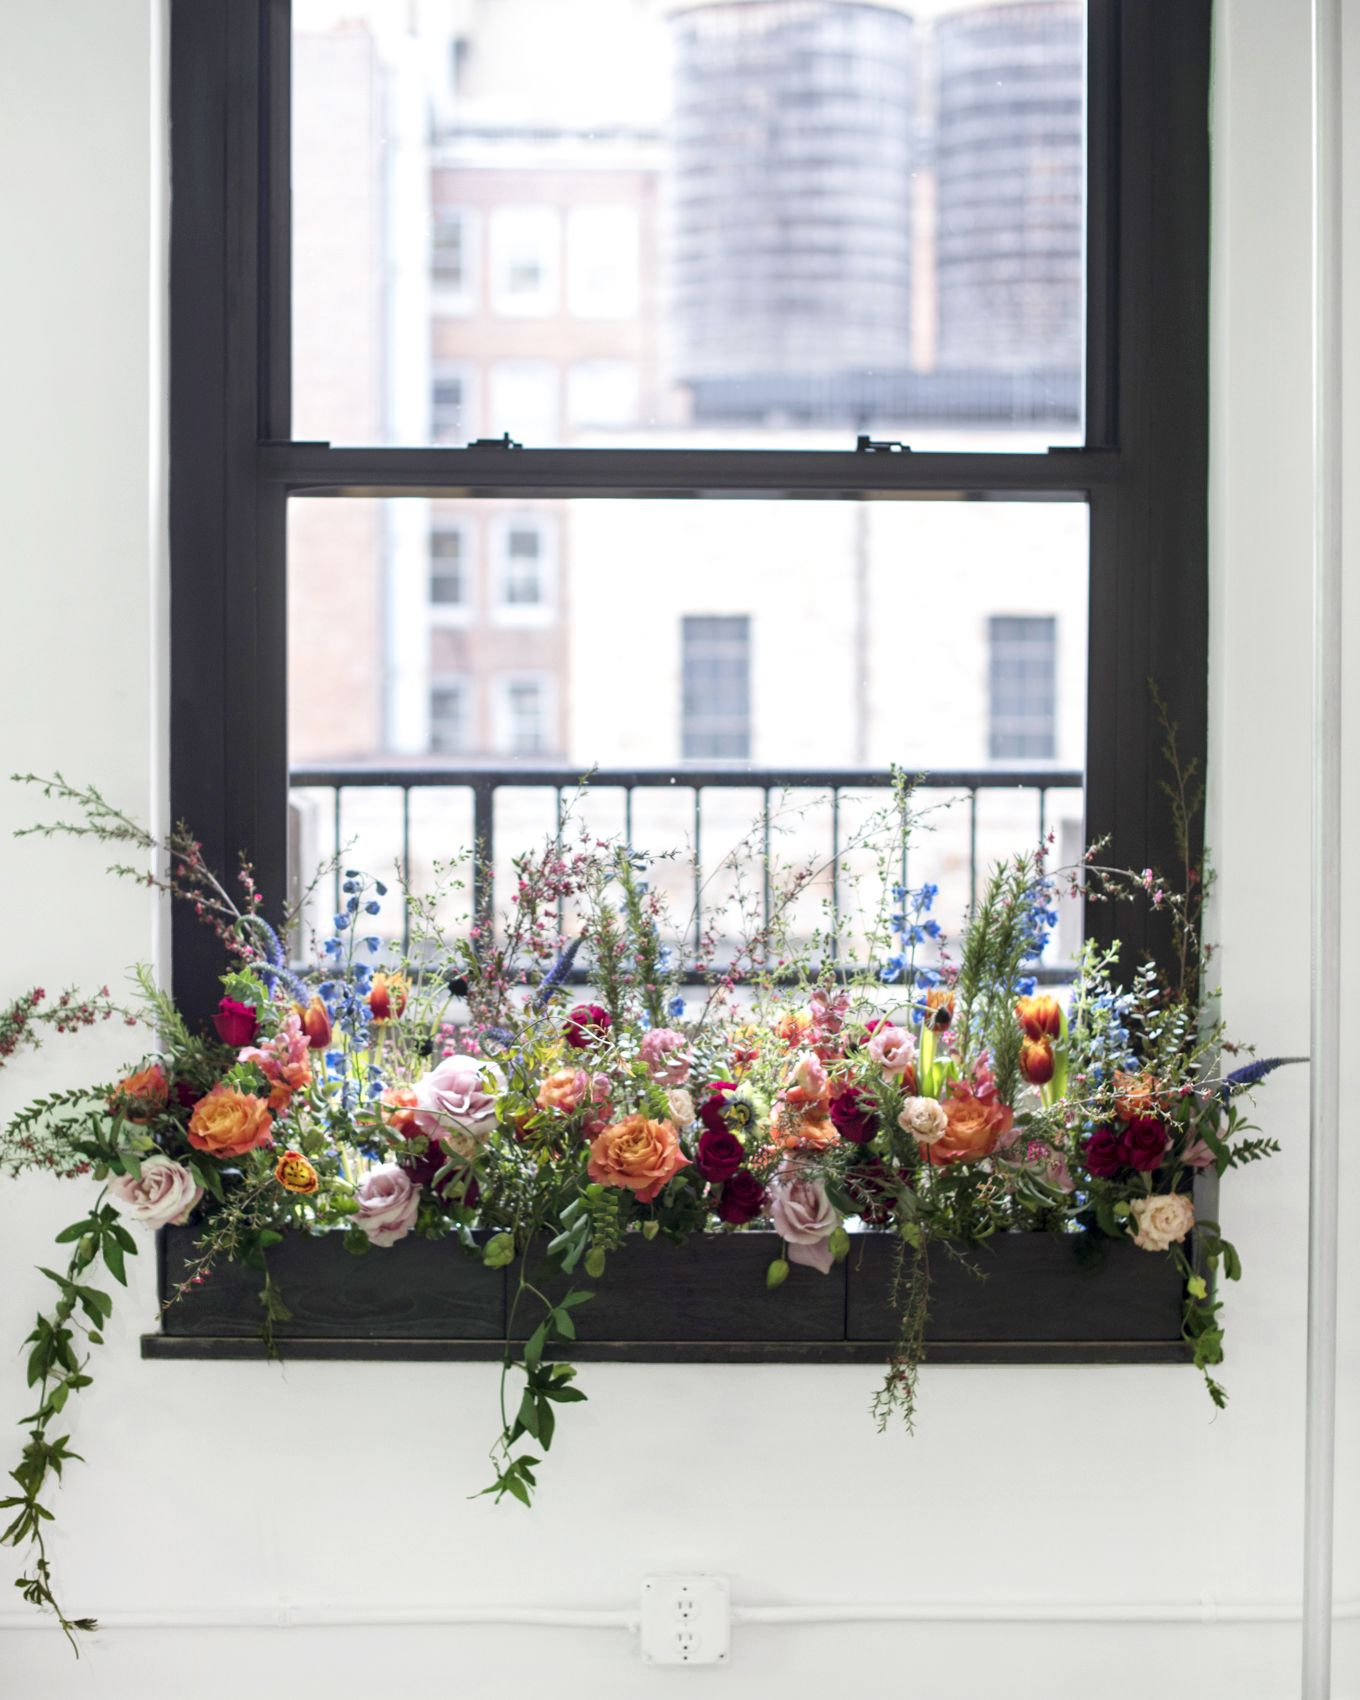 Interior Florals Our Contemporary Design Fixation Garden Collage Magazine Indoor Window Indoor Flowers Window Box Flowers